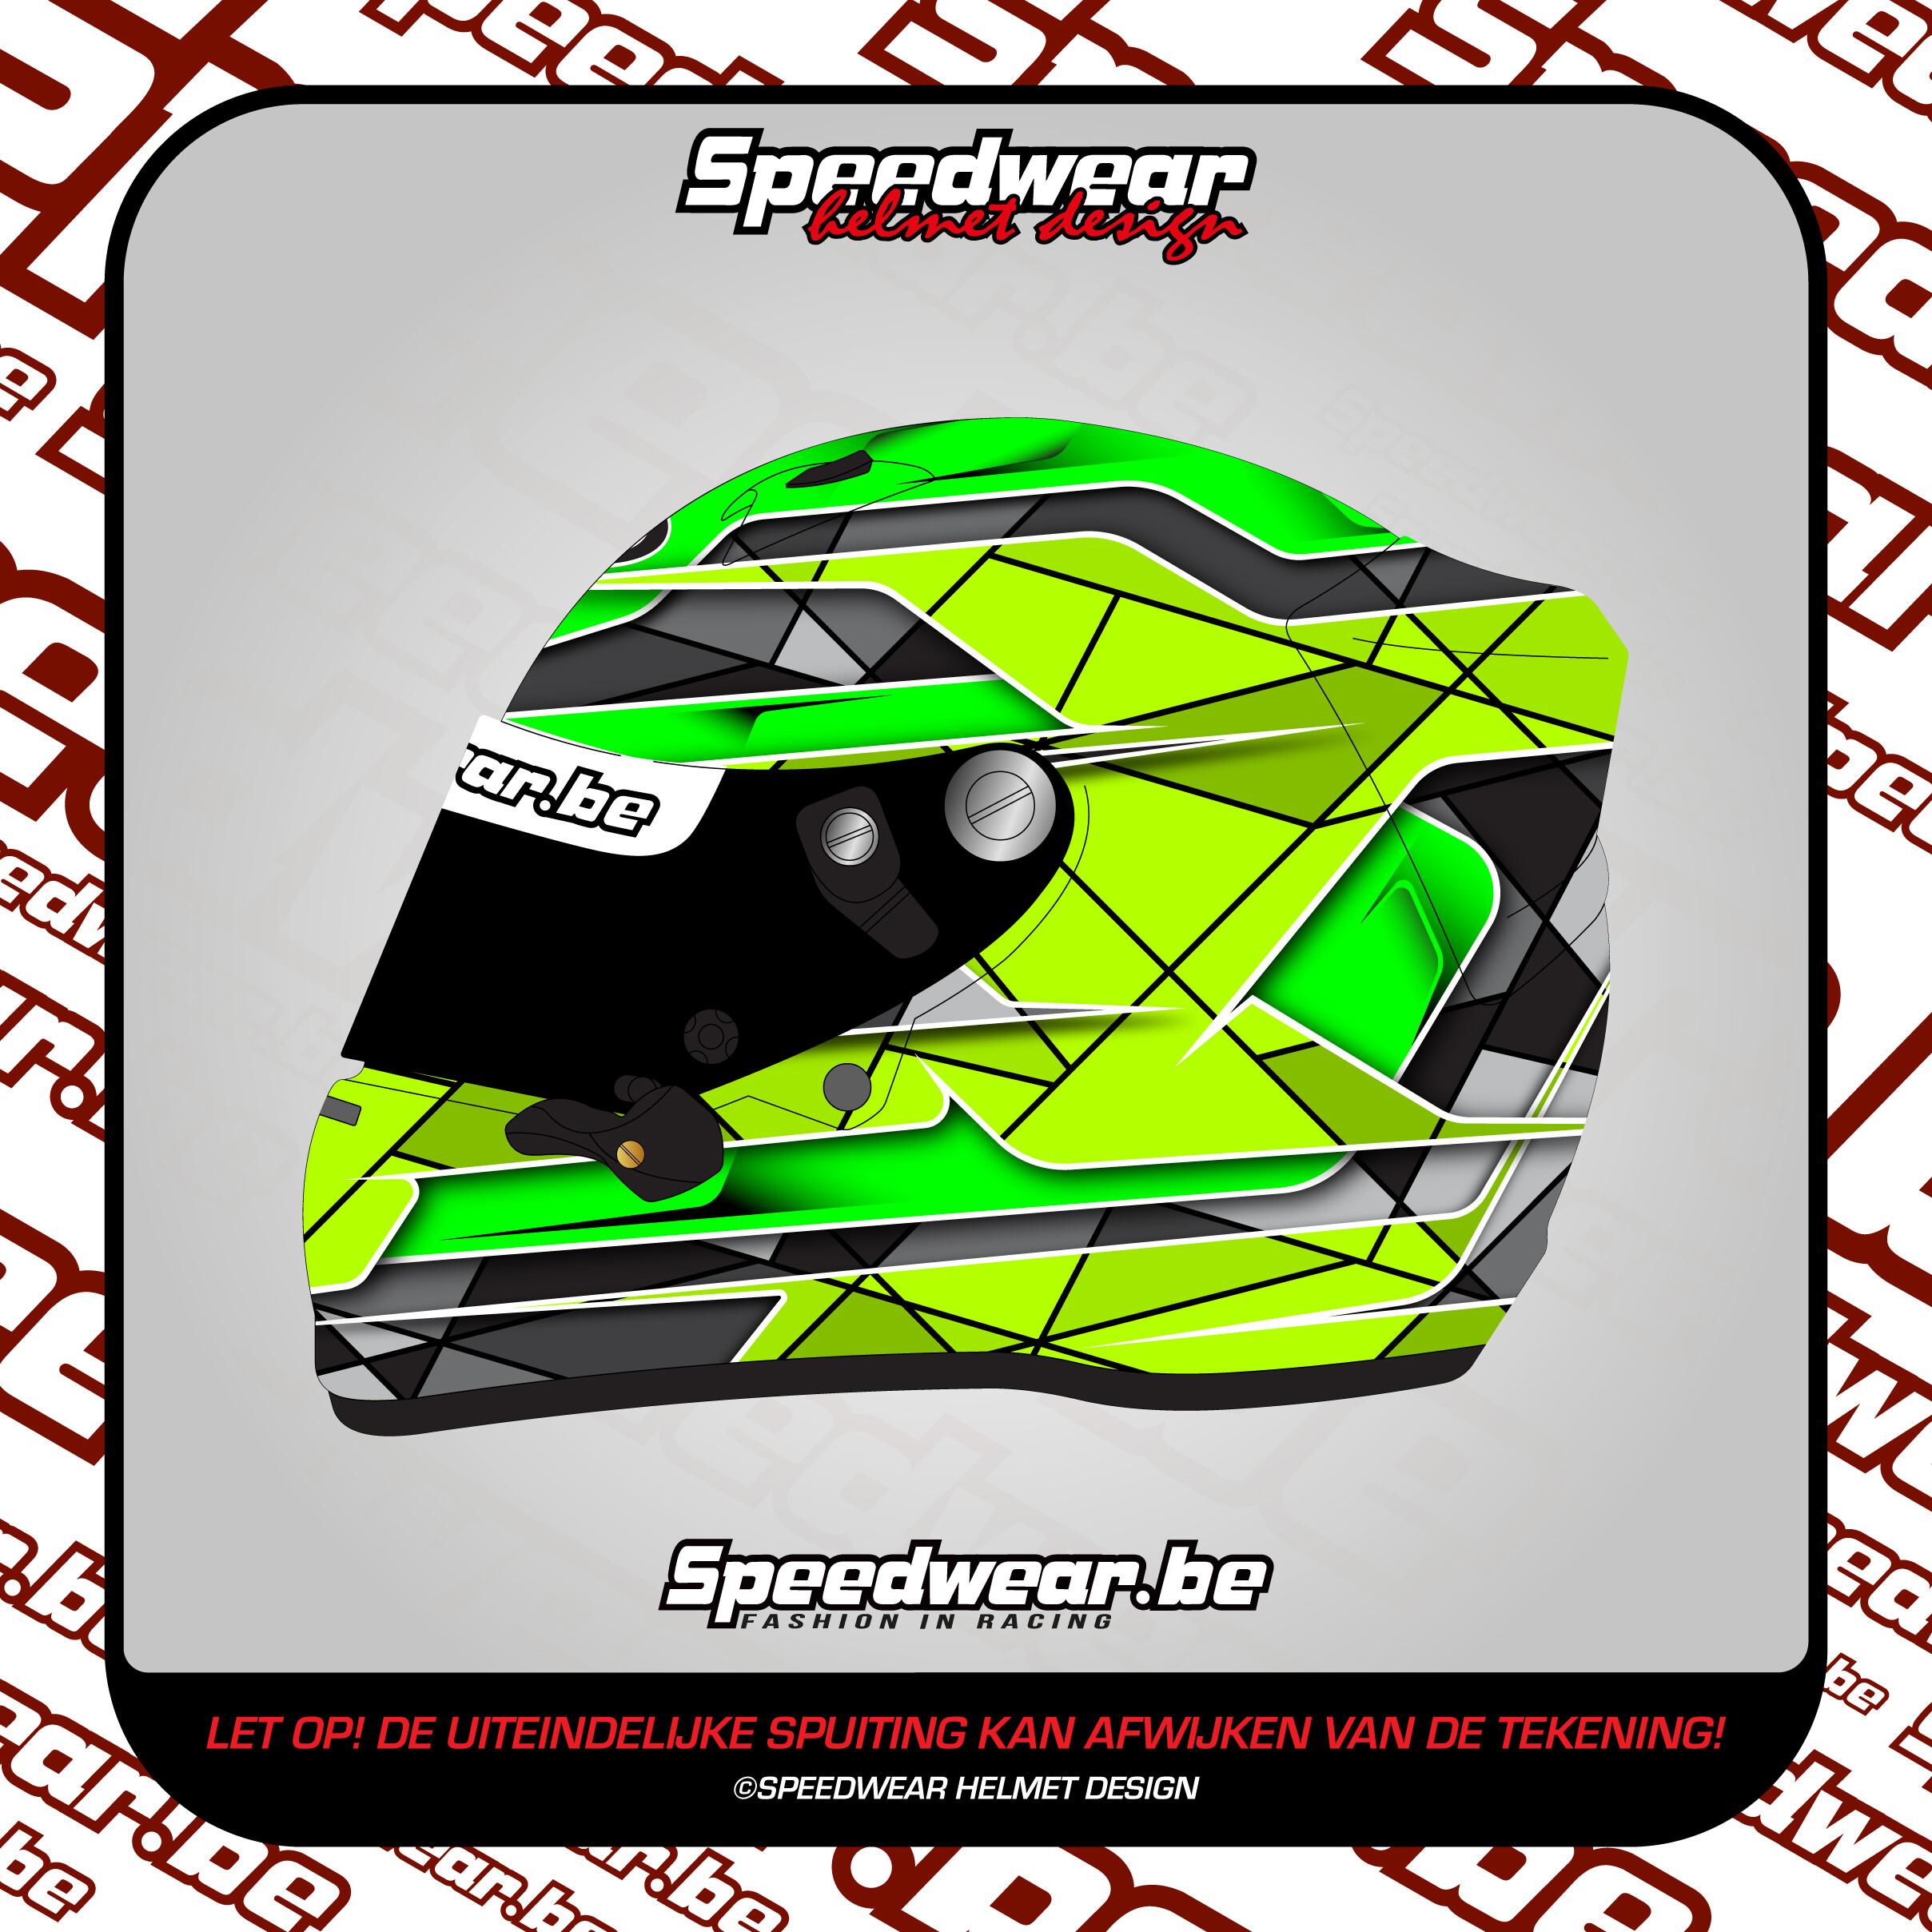 SpeedPaint Deal Adria Raceway